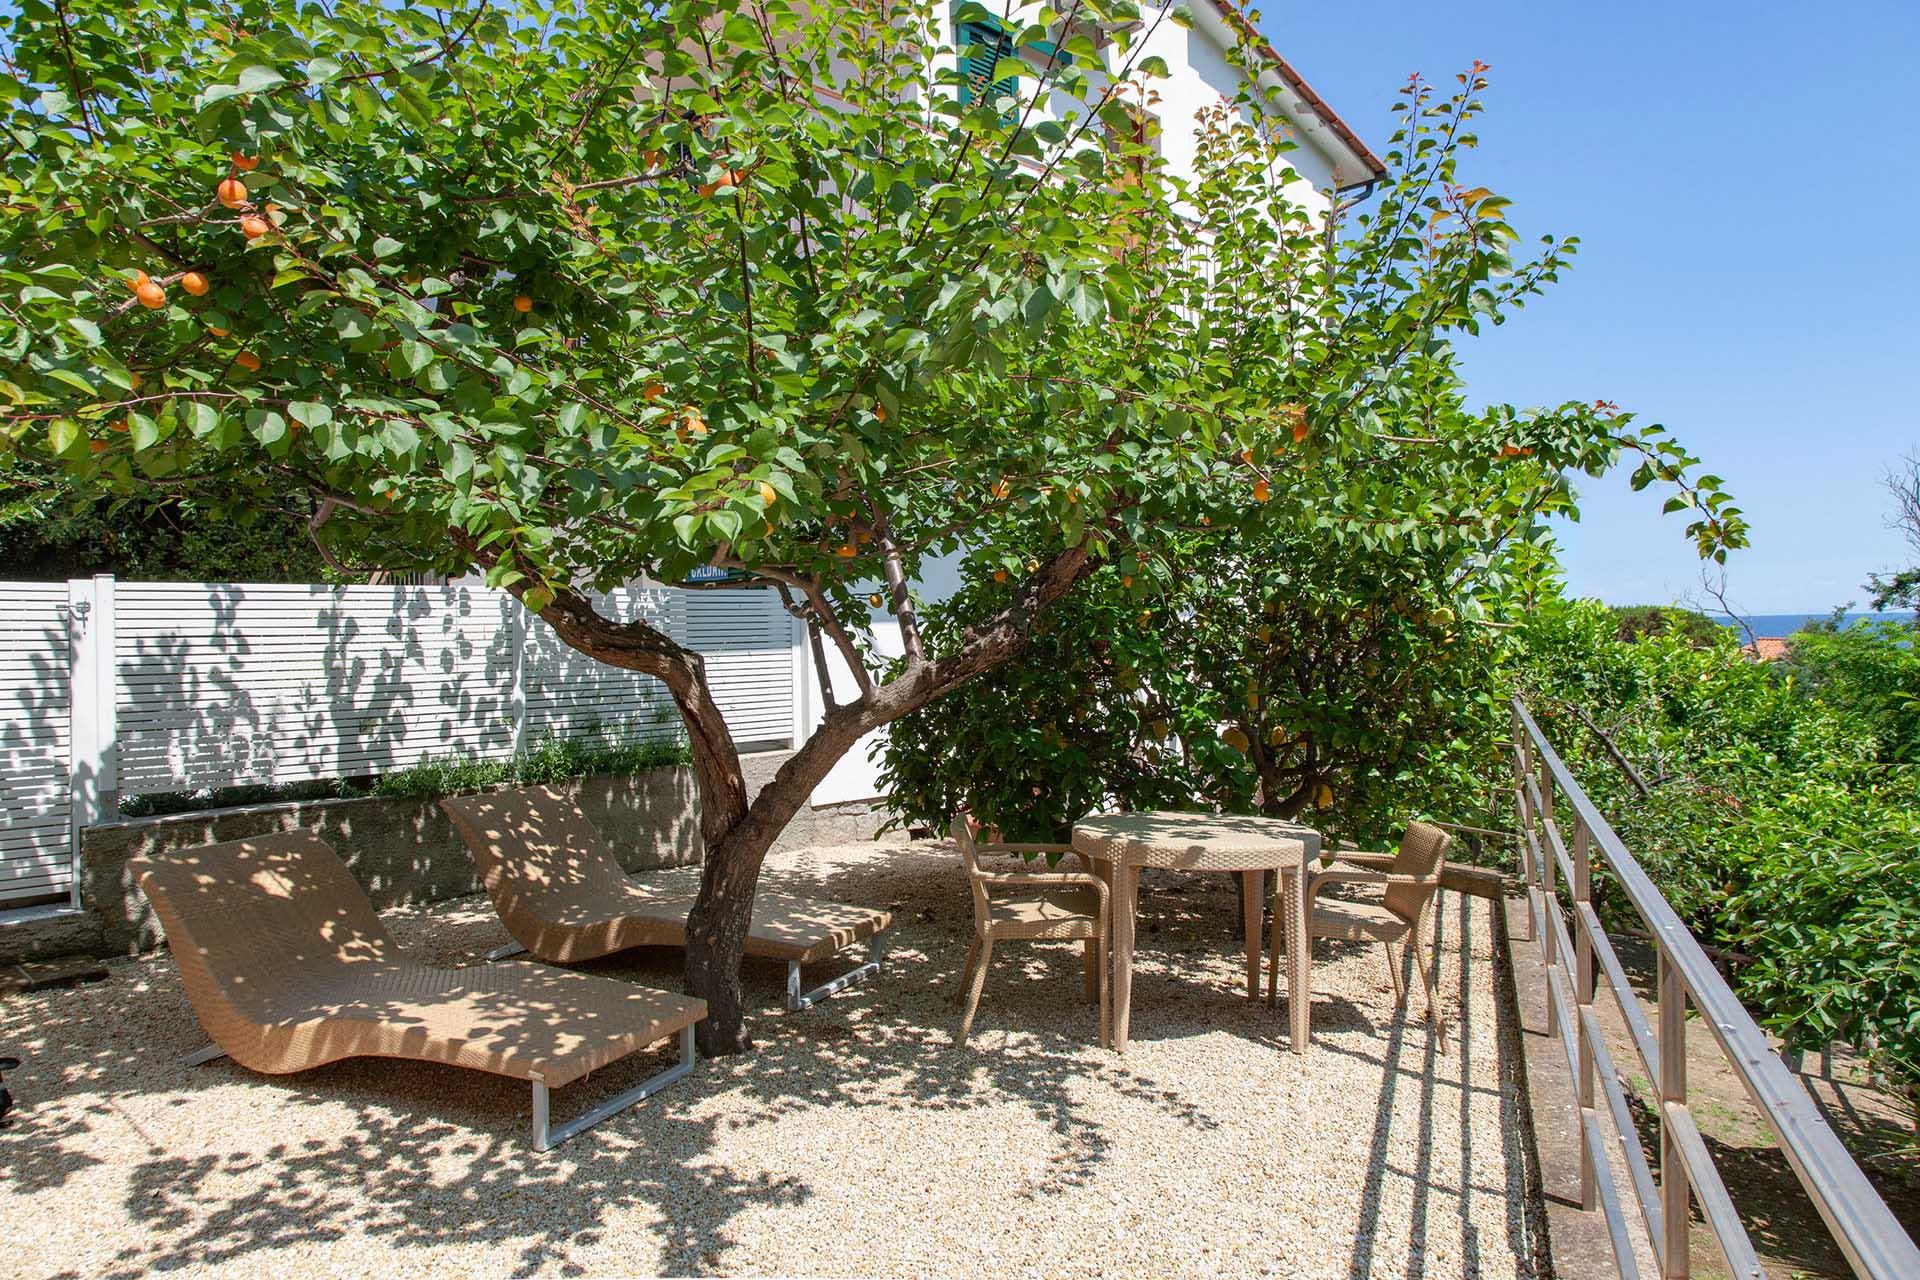 Visit Elba Island Tuscany Tourism Garden Hotels